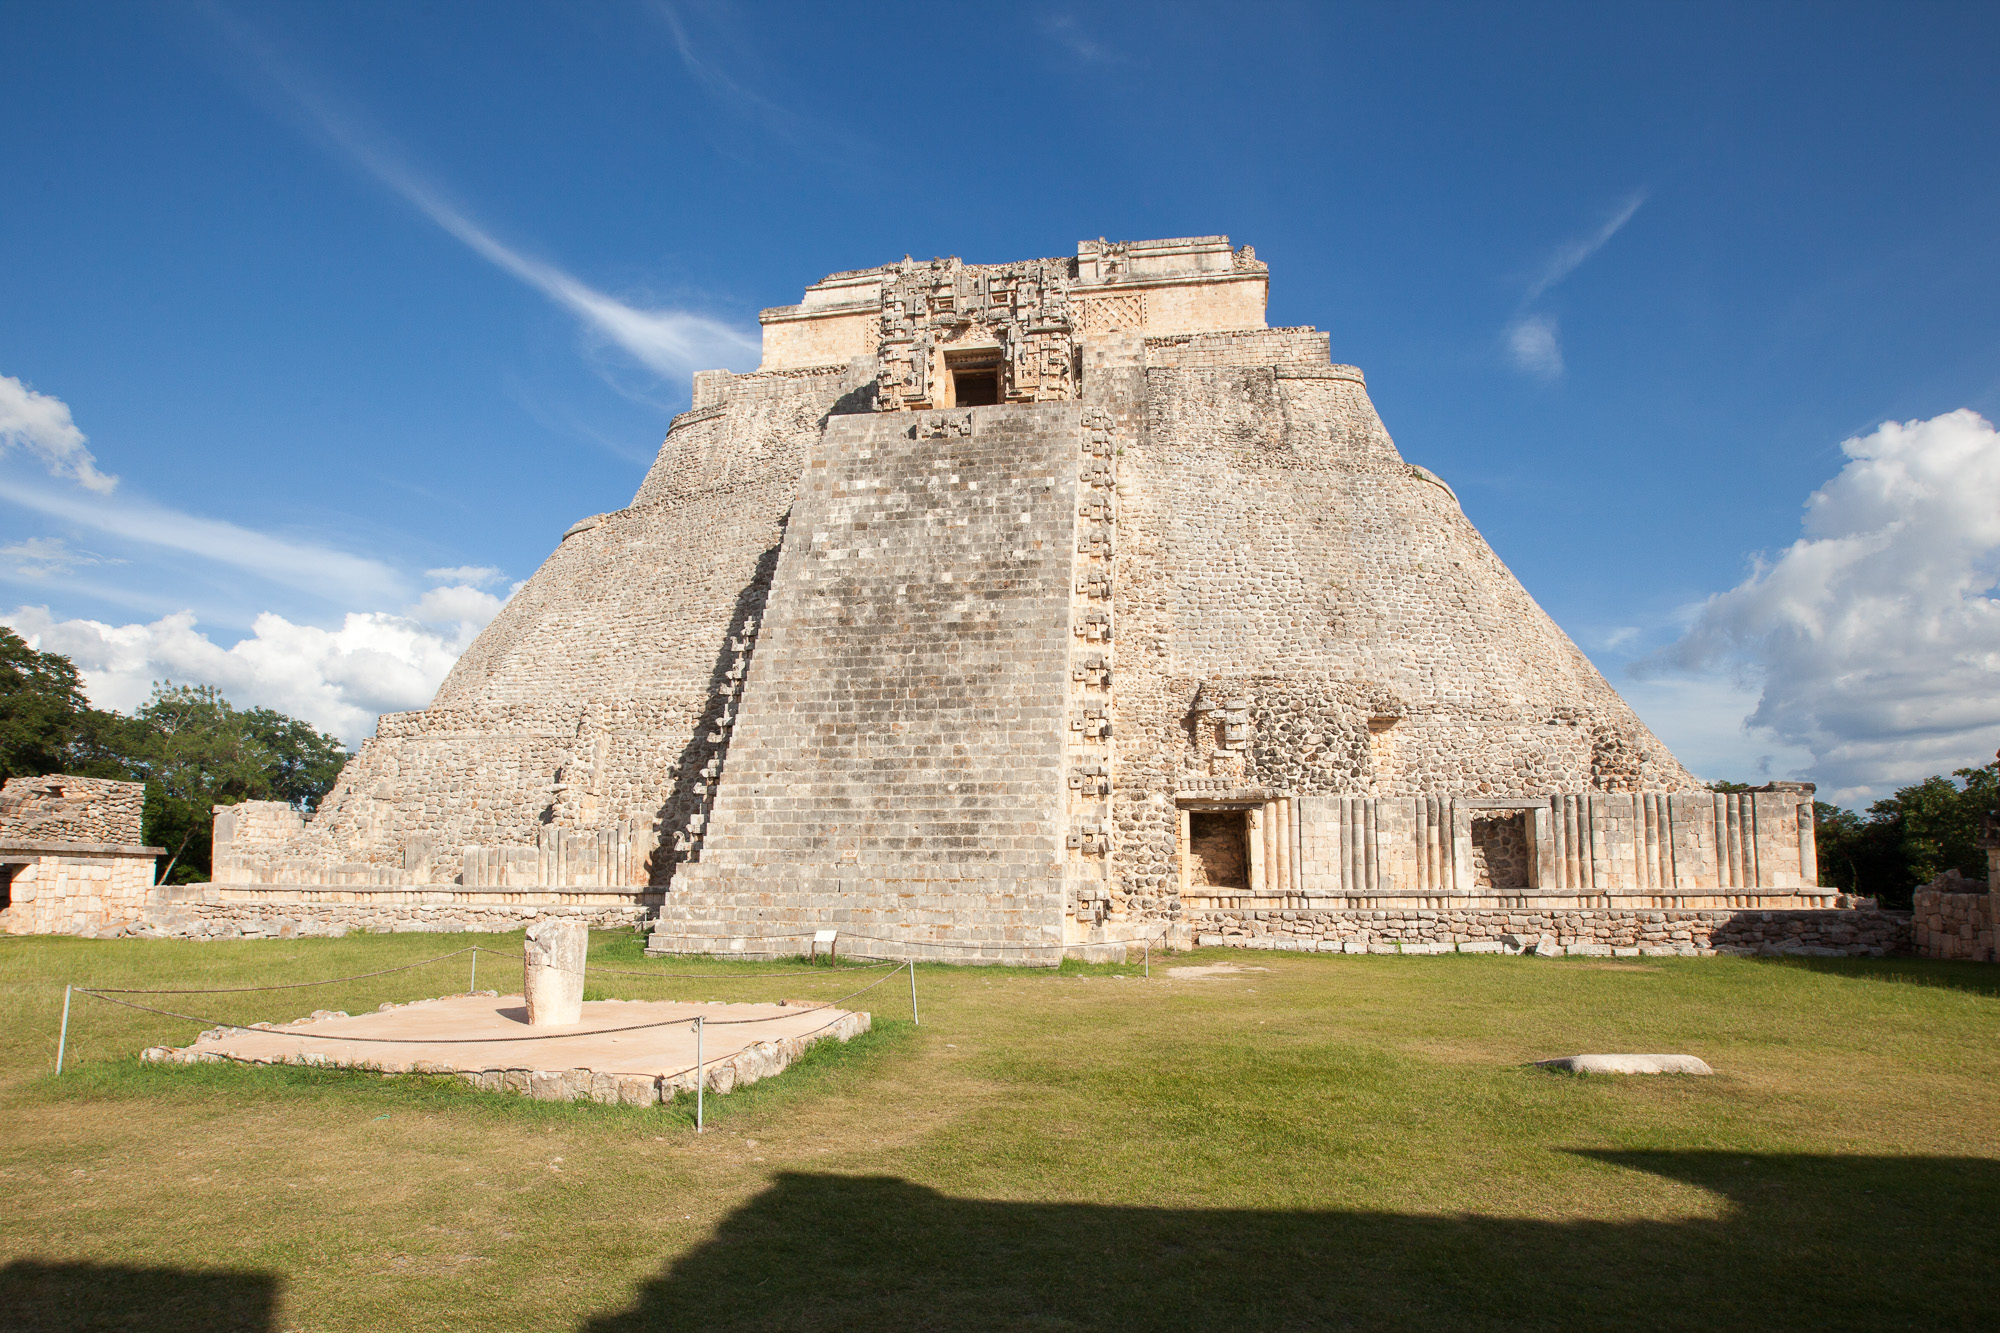 Antikke byer på Yucatán